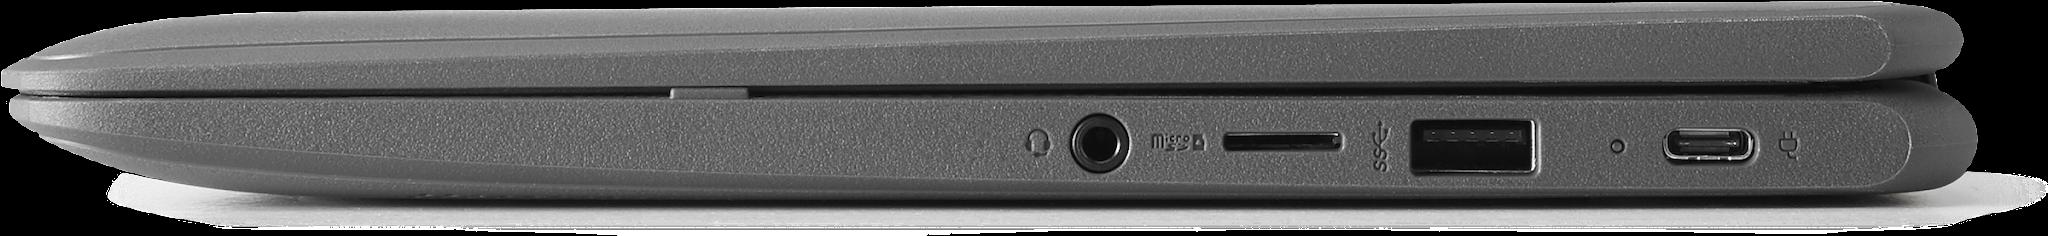 HP Chromebook x360 11 G1 - photo 9